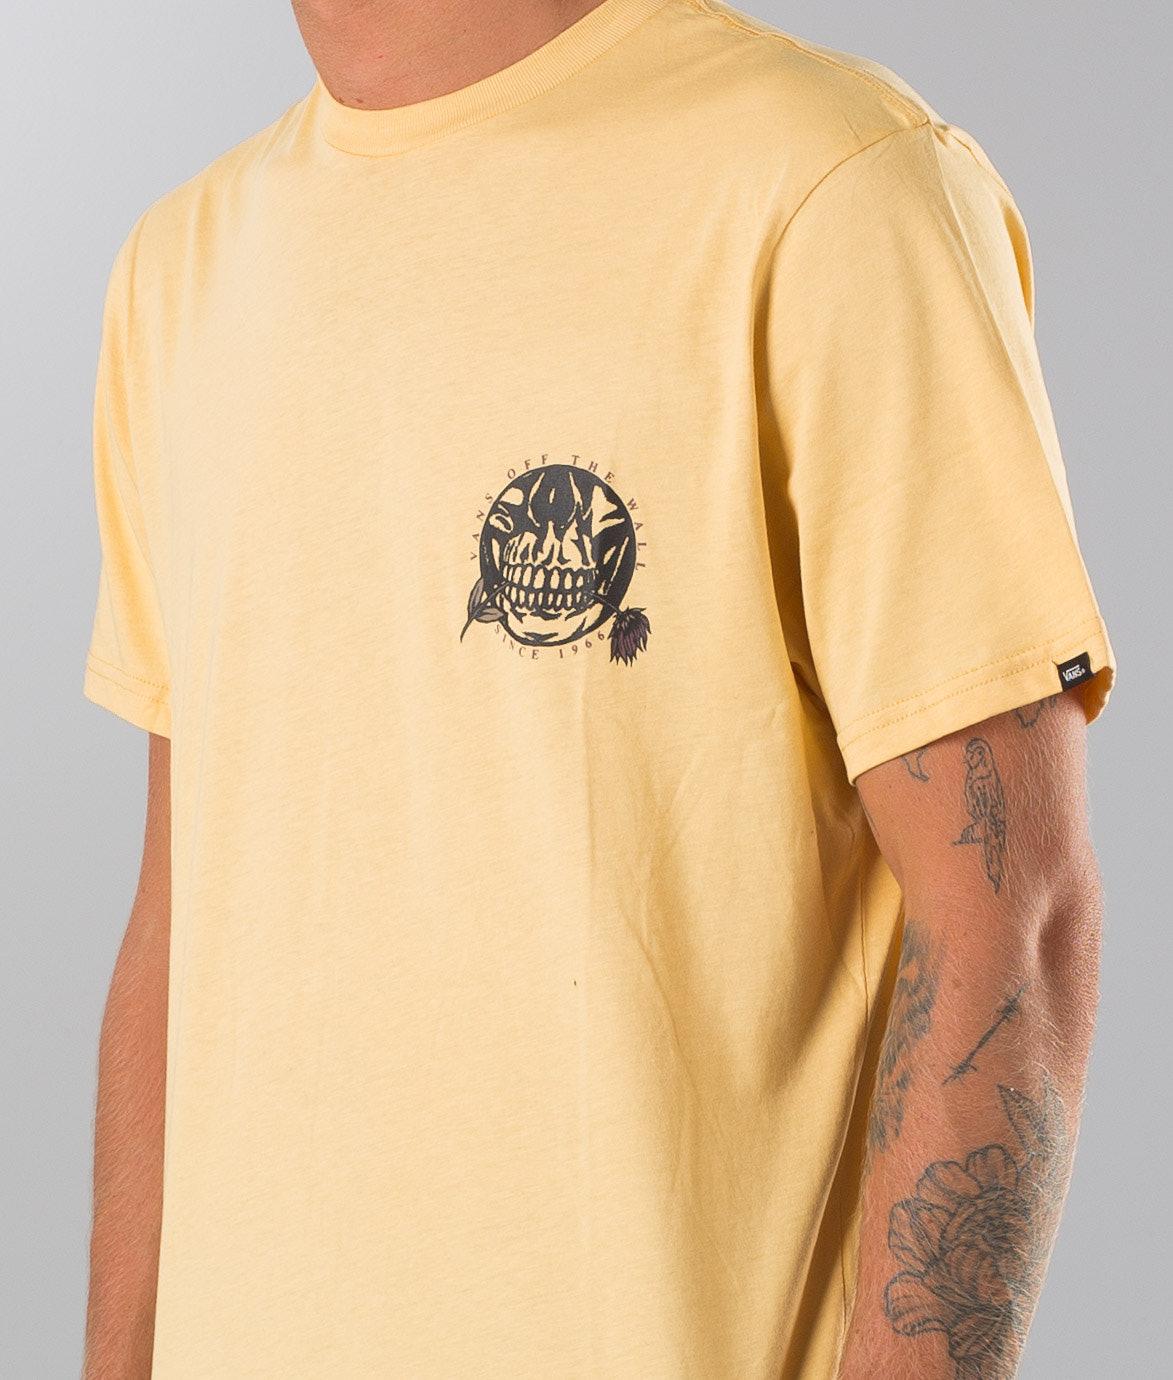 decc08545e Vans Pushing Up Daisies T-shirt New Wheat - Ridestore.com